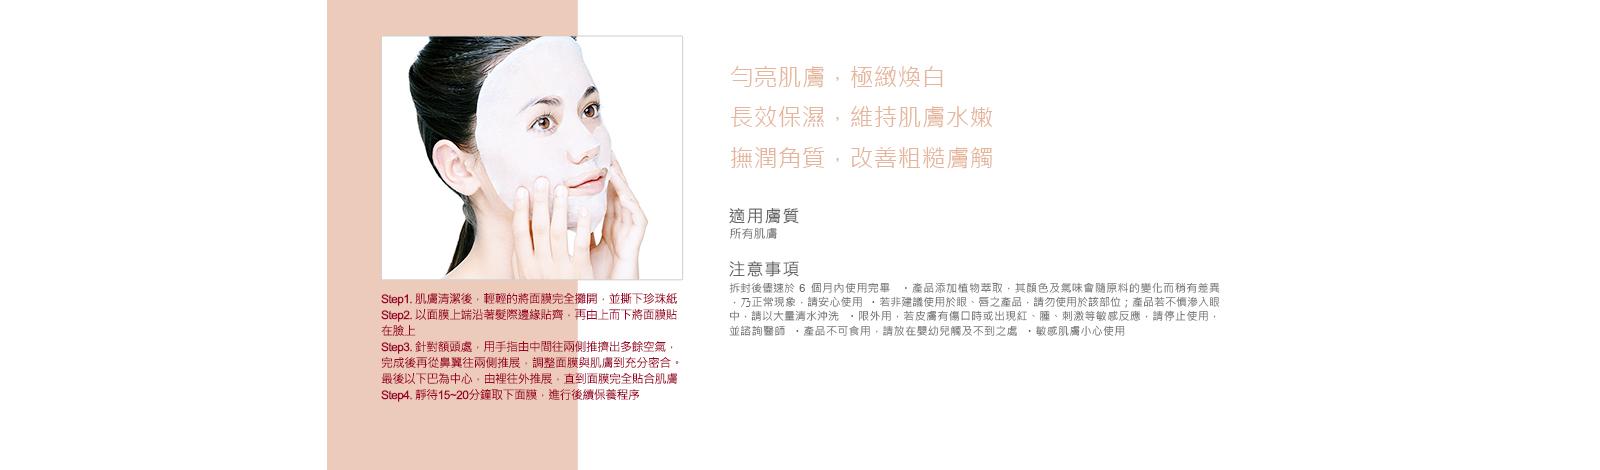 rjt-mask-cn-3-.jpg